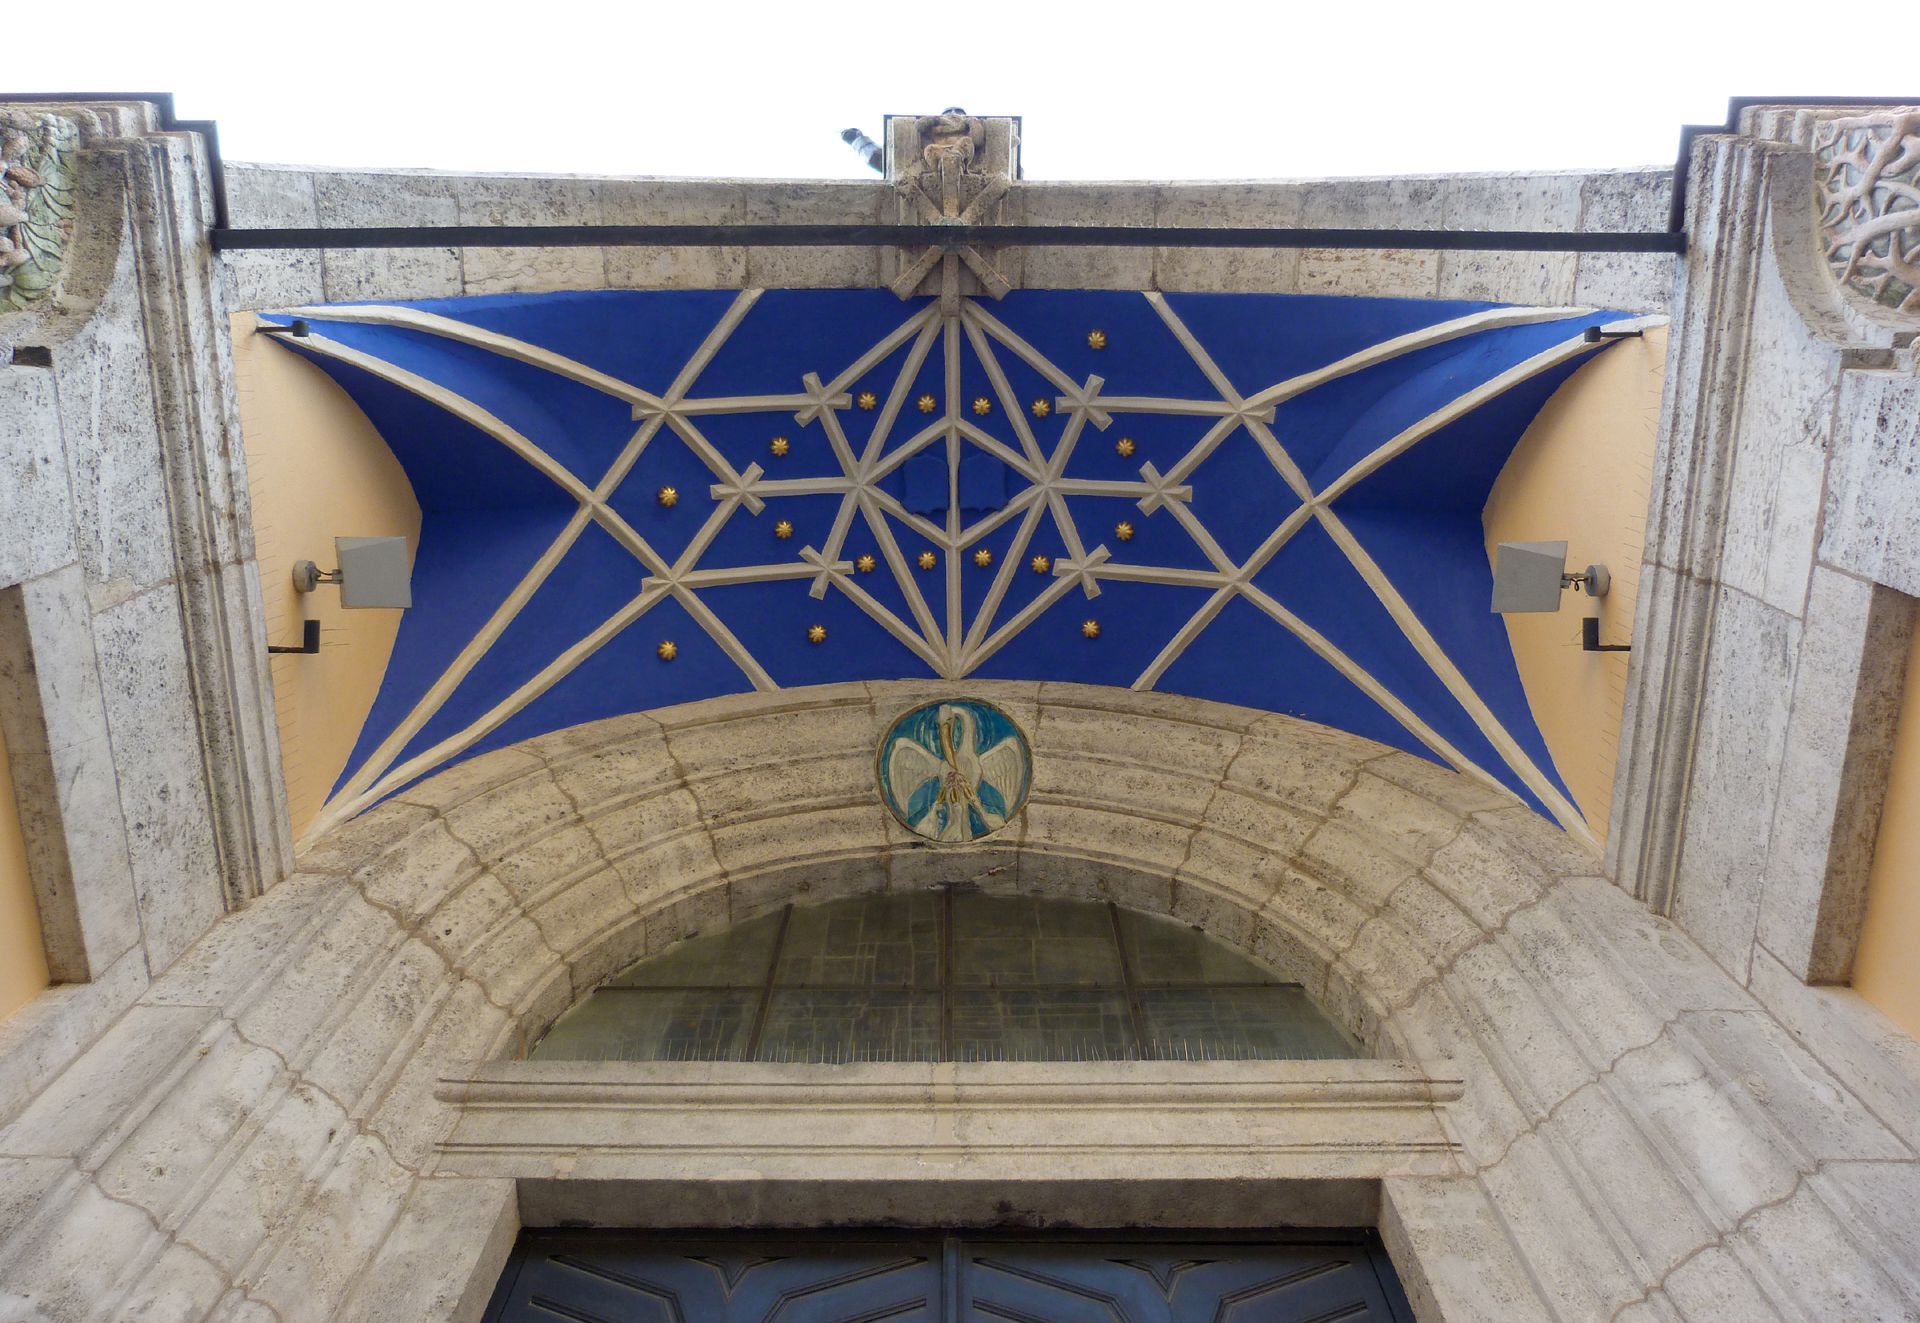 St. Anton Church Entrance hall, reticulated vault